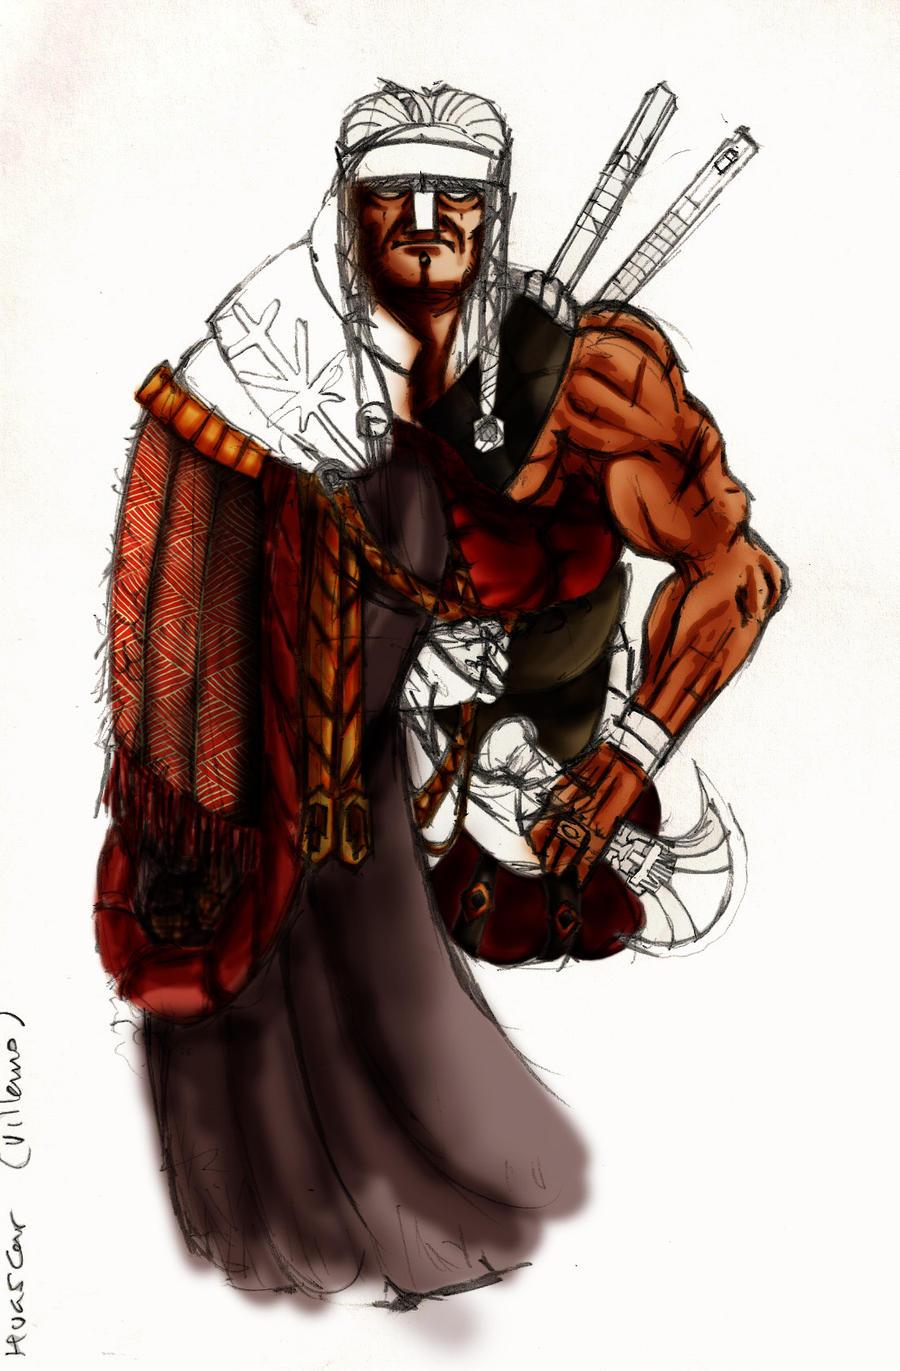 inca warrior 2 by flyrrow on DeviantArt